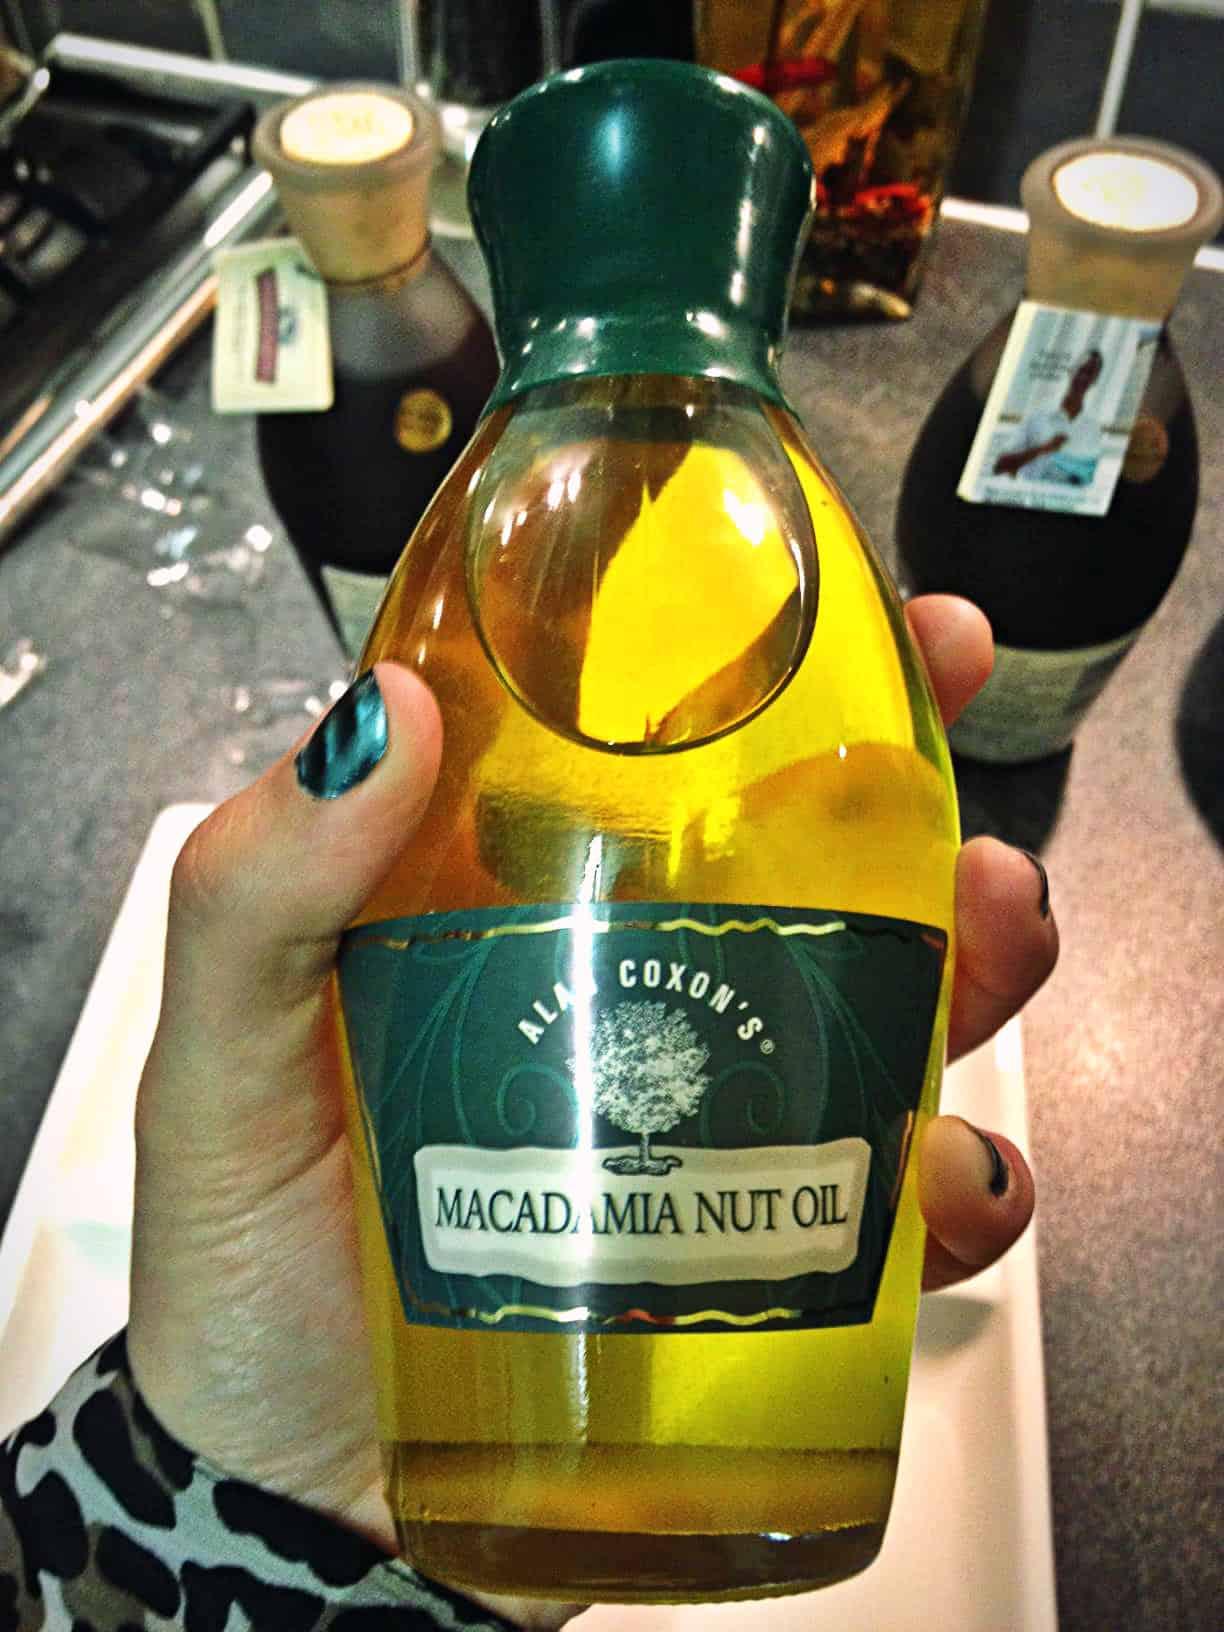 Alan Coxon macadamia nut oil